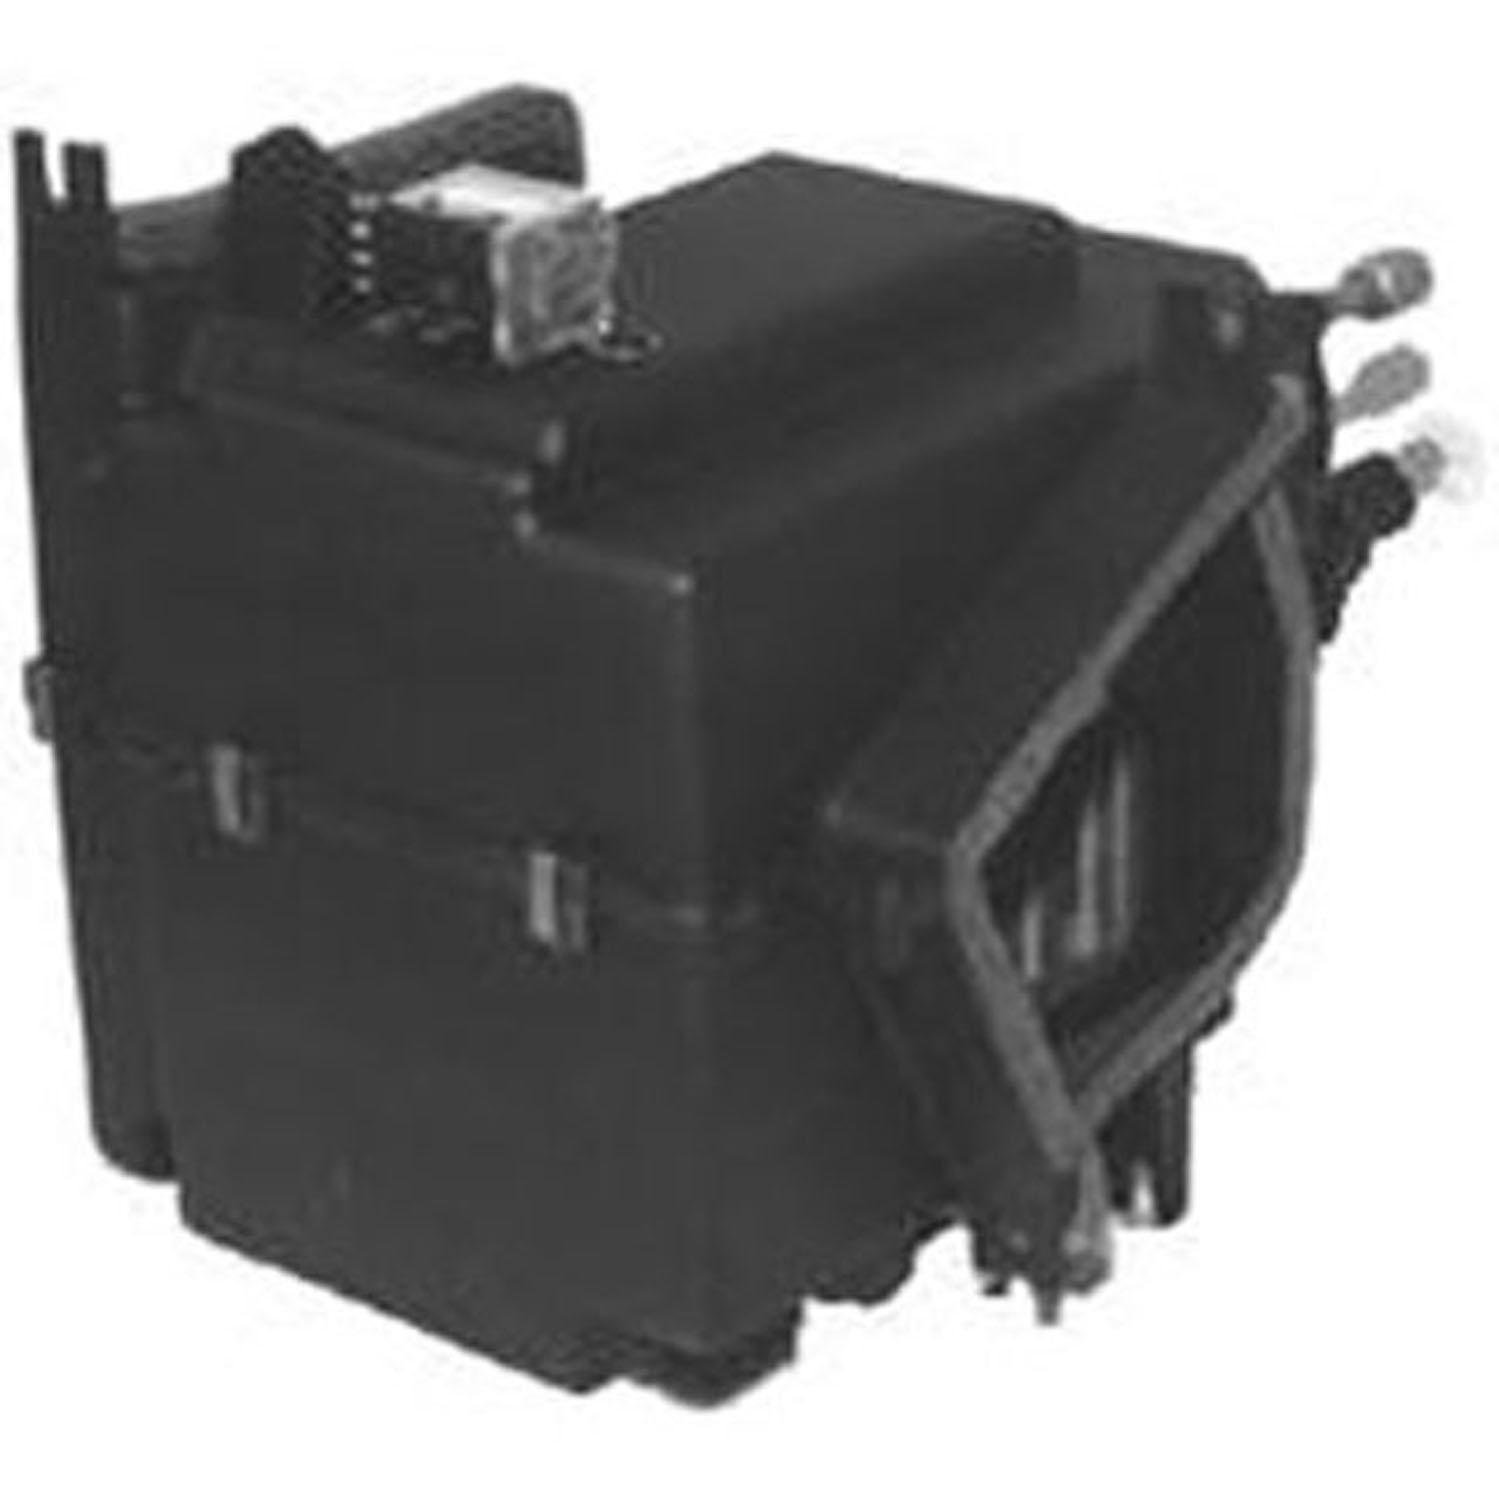 Evaporator Assembly TOY TACOMA 96-95